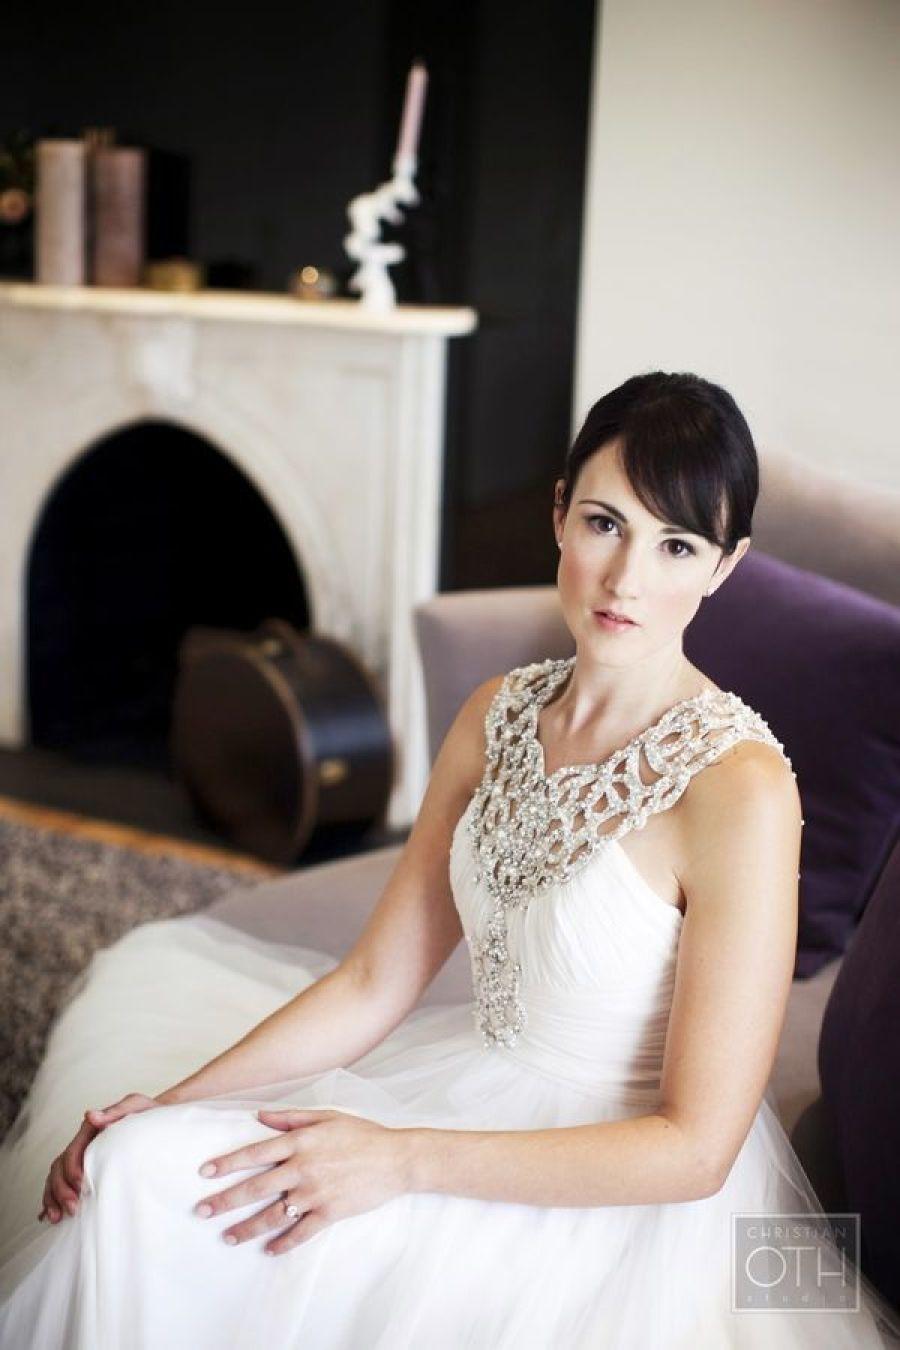 Glamorous city wedding by christian oth studio vaulting wedding